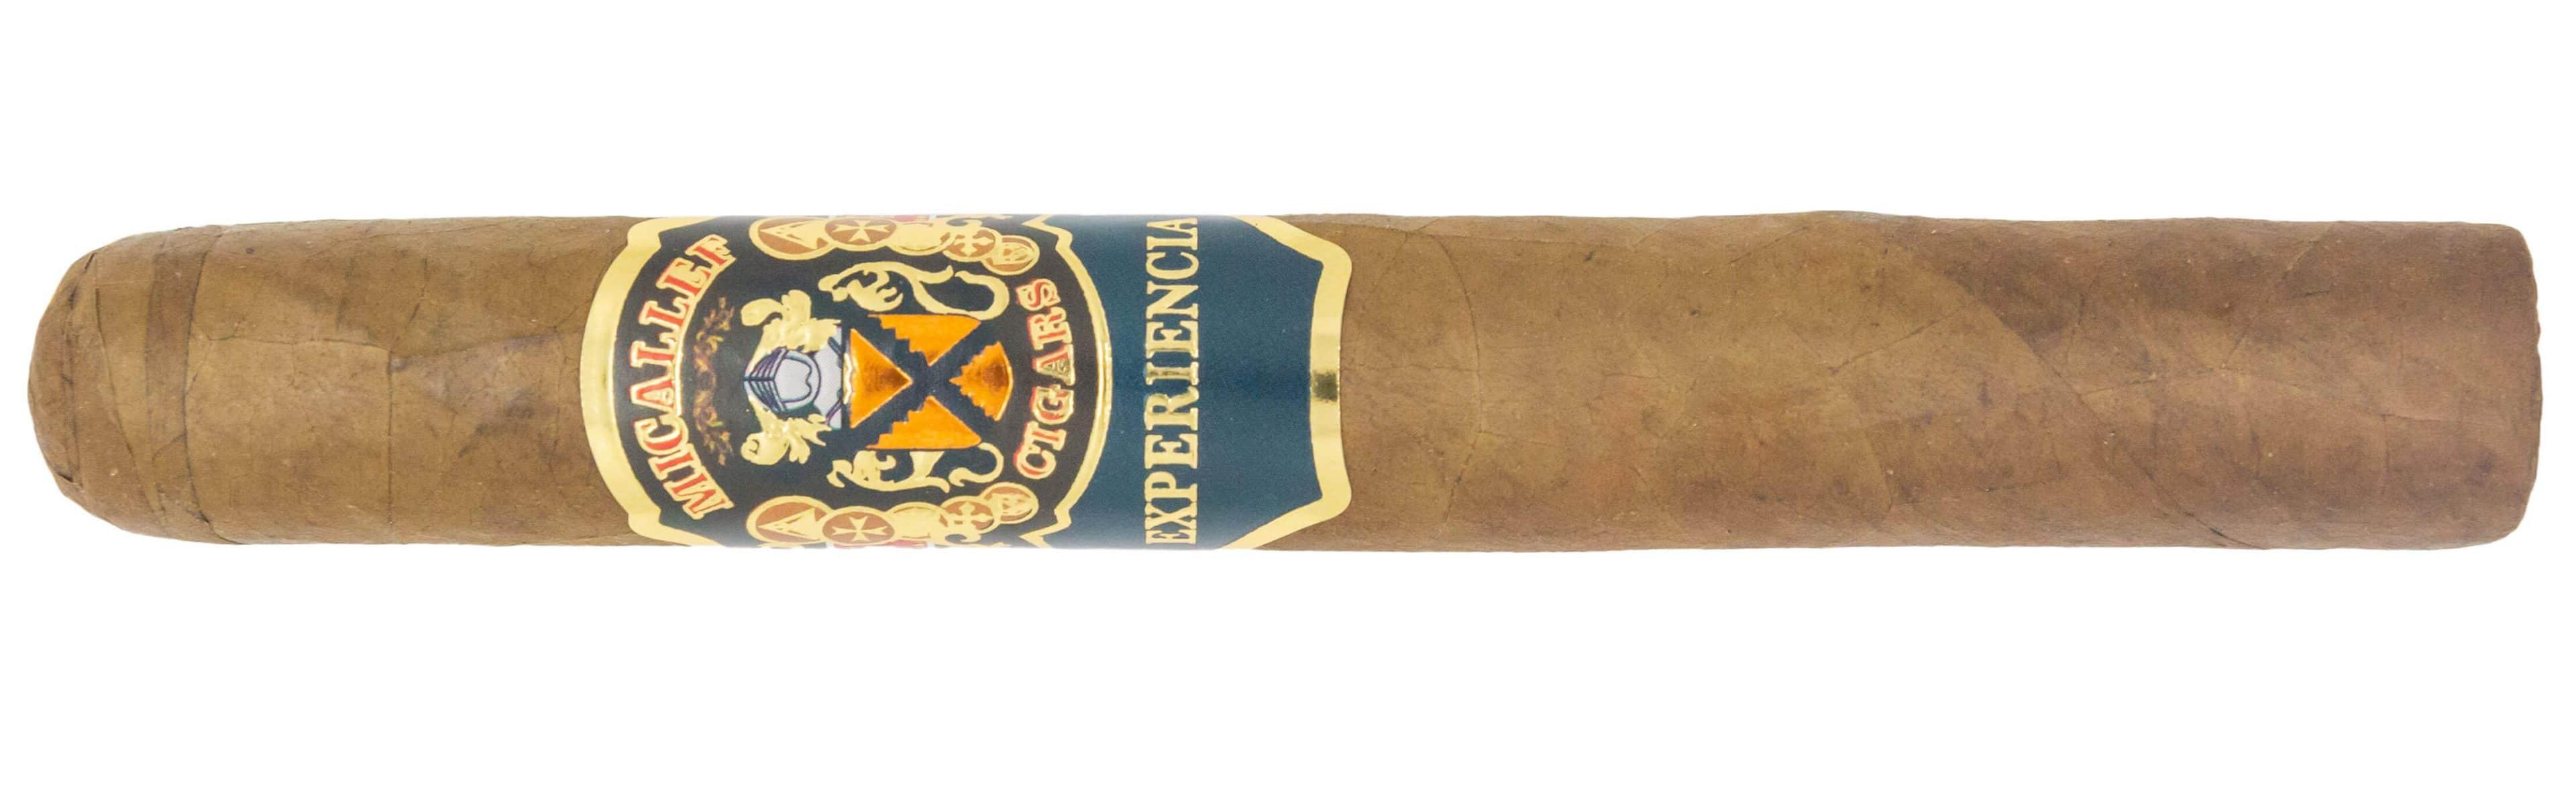 Blind Cigar Review: Micallef   Experiencia La Crema Toro